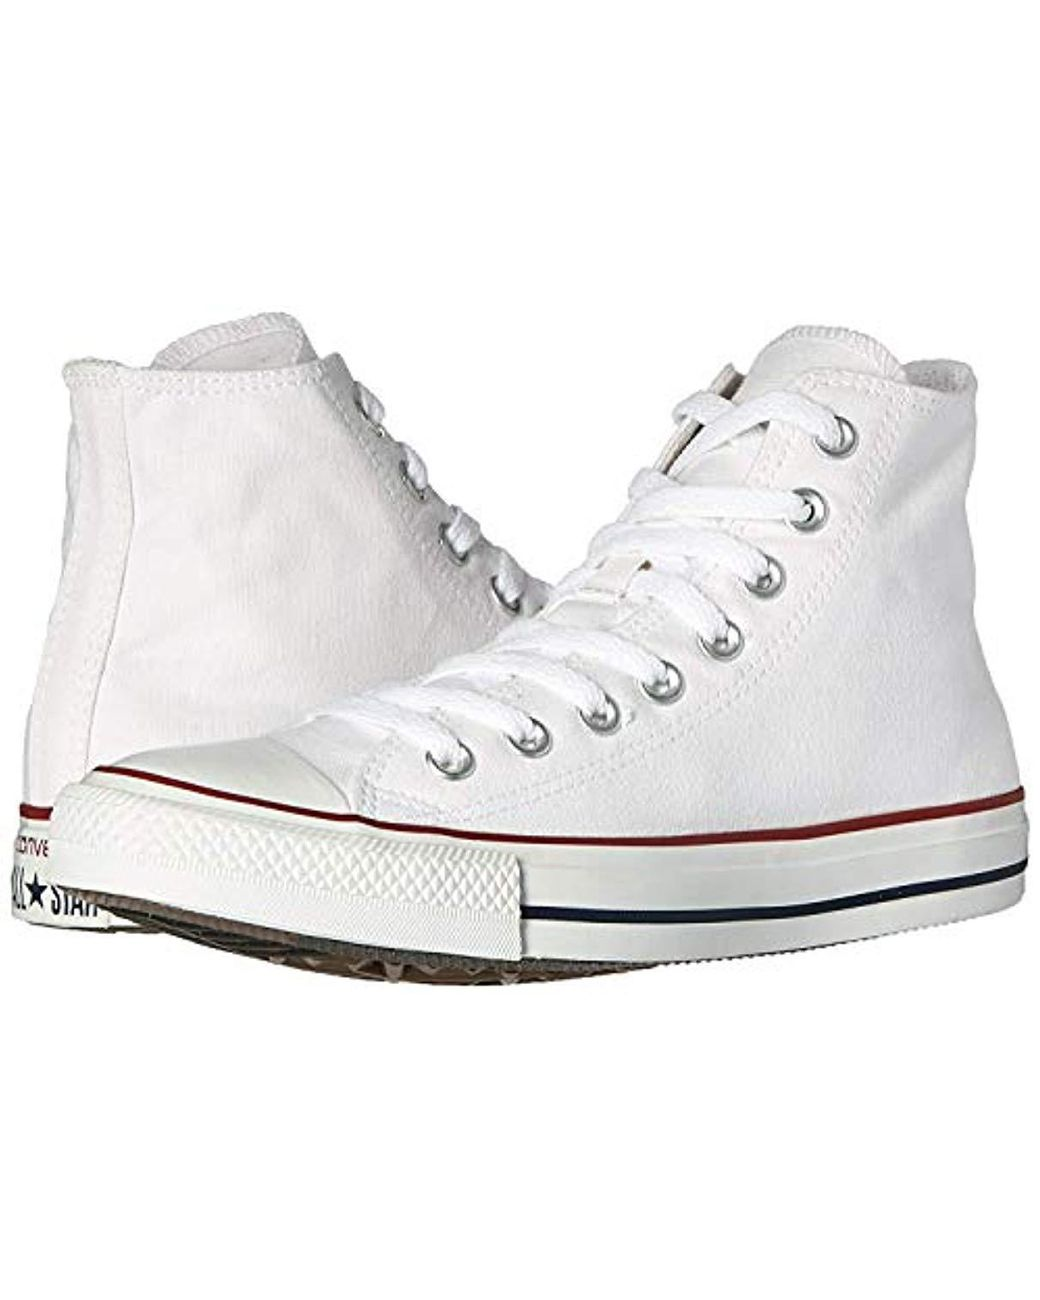 Converse Unisex Chuck Taylor All Star Ox Basketball Shoe (7.5 B(M) US Women 5.5 D(M) US Men, Optical White)